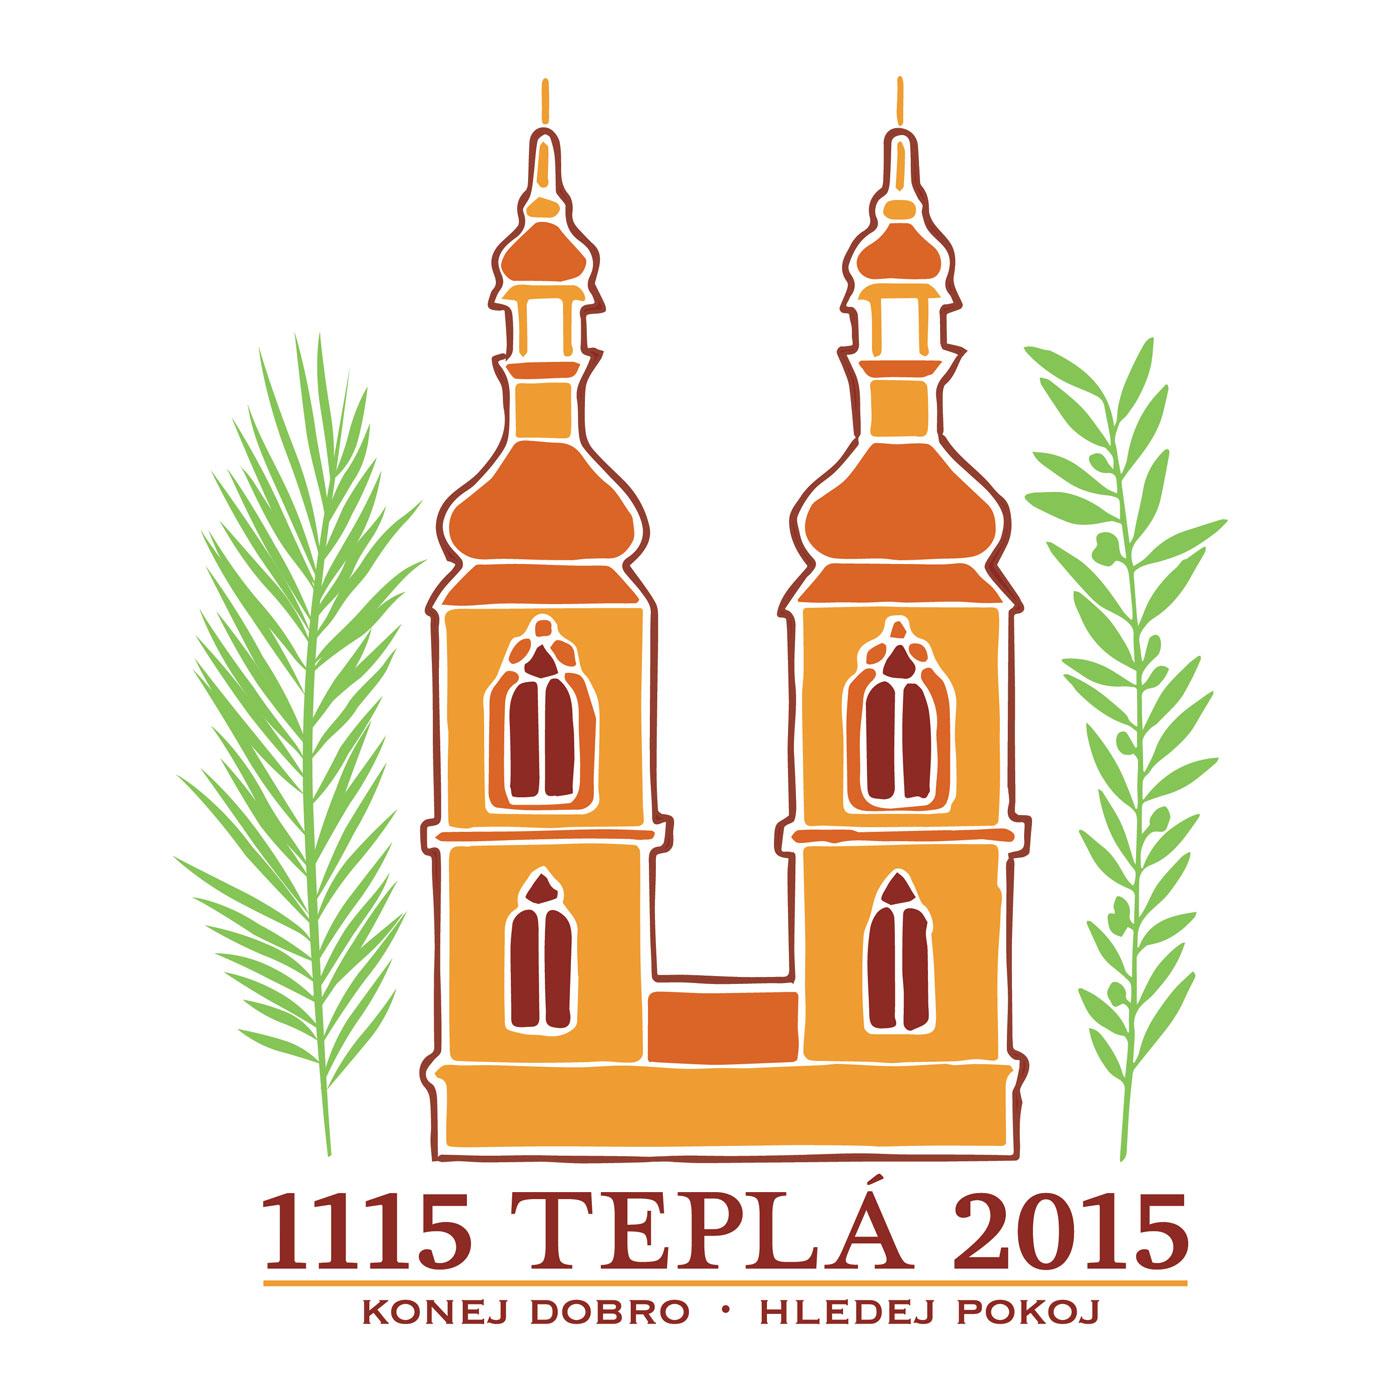 Tepla-2015-Logo.jpg